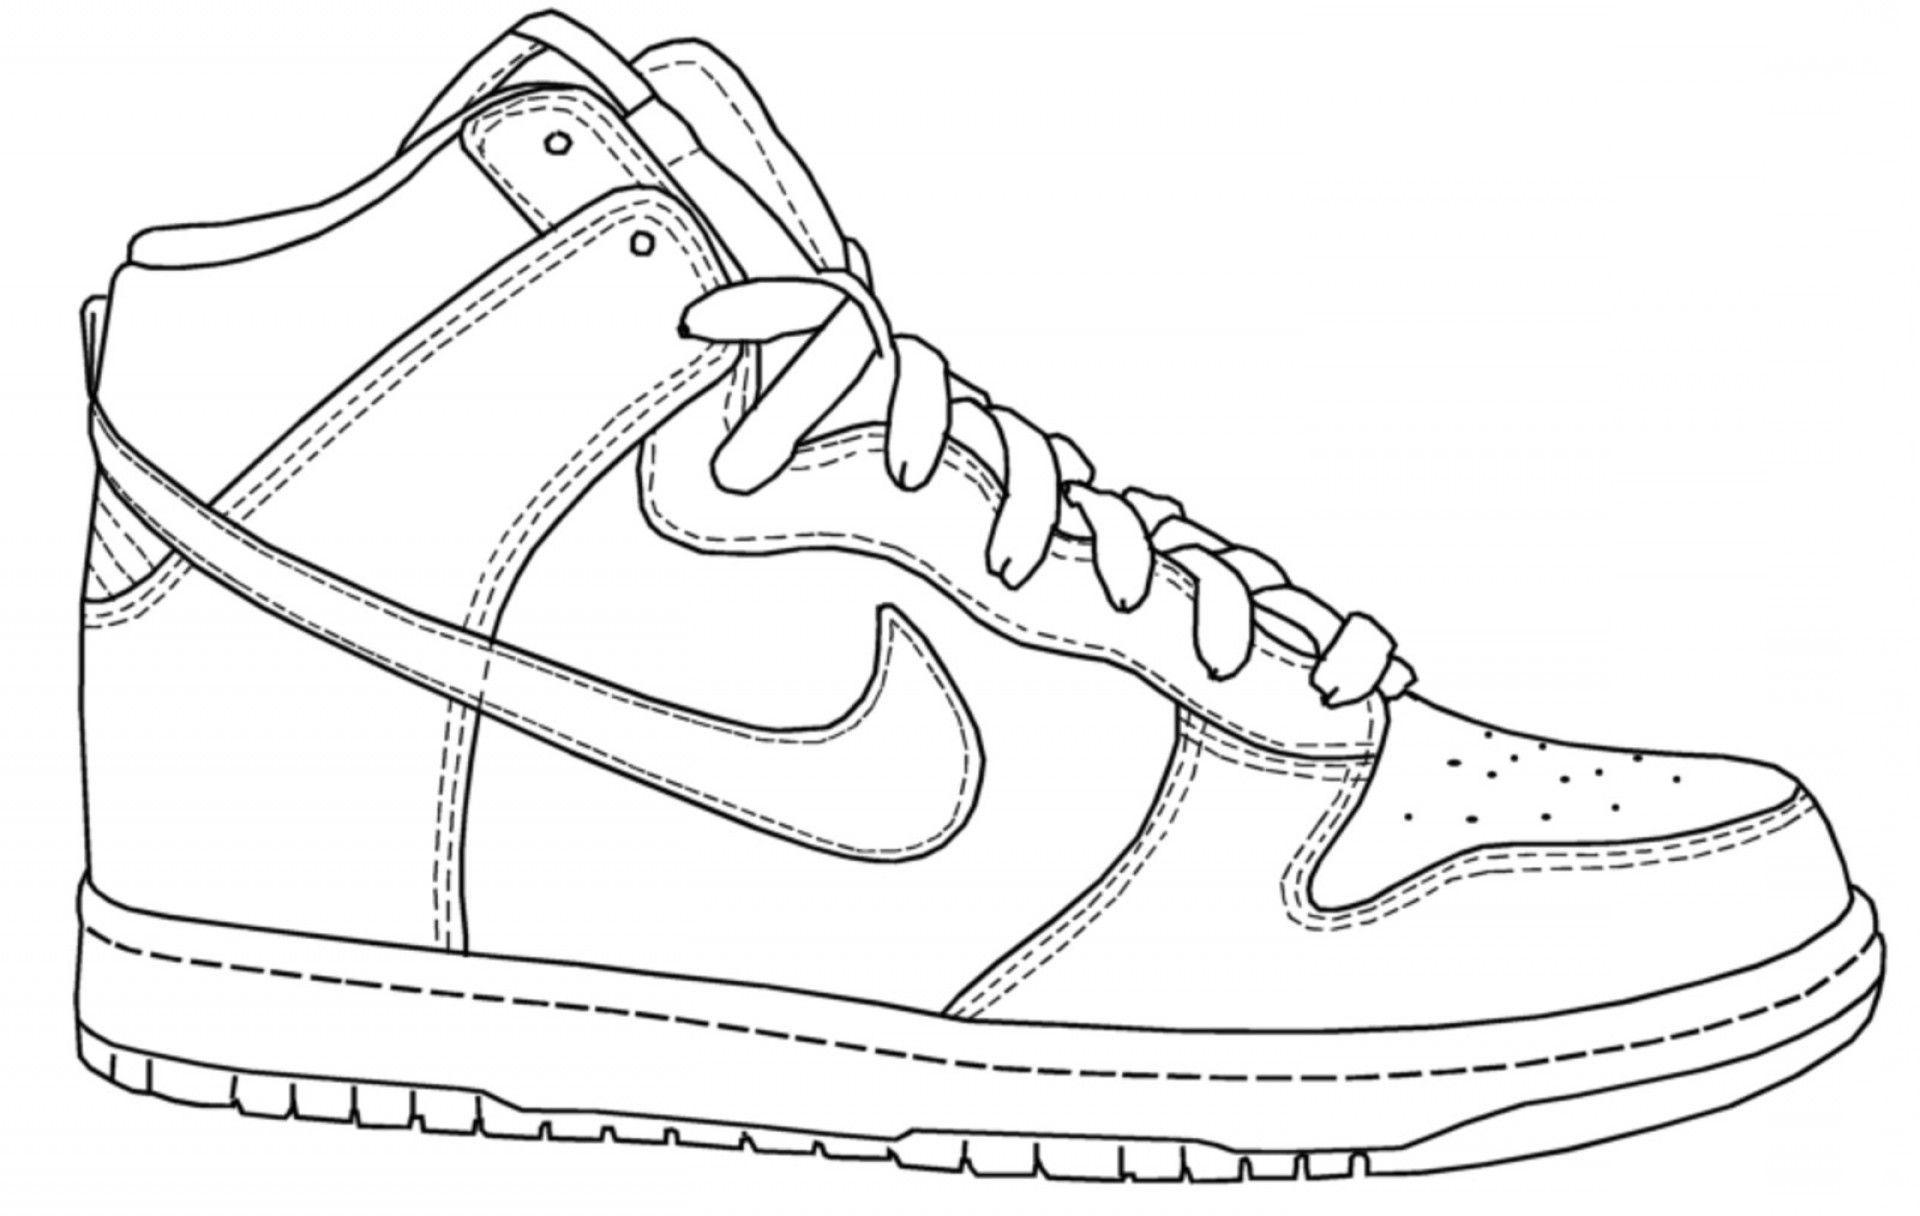 Coloring Sheets Nike Shoes